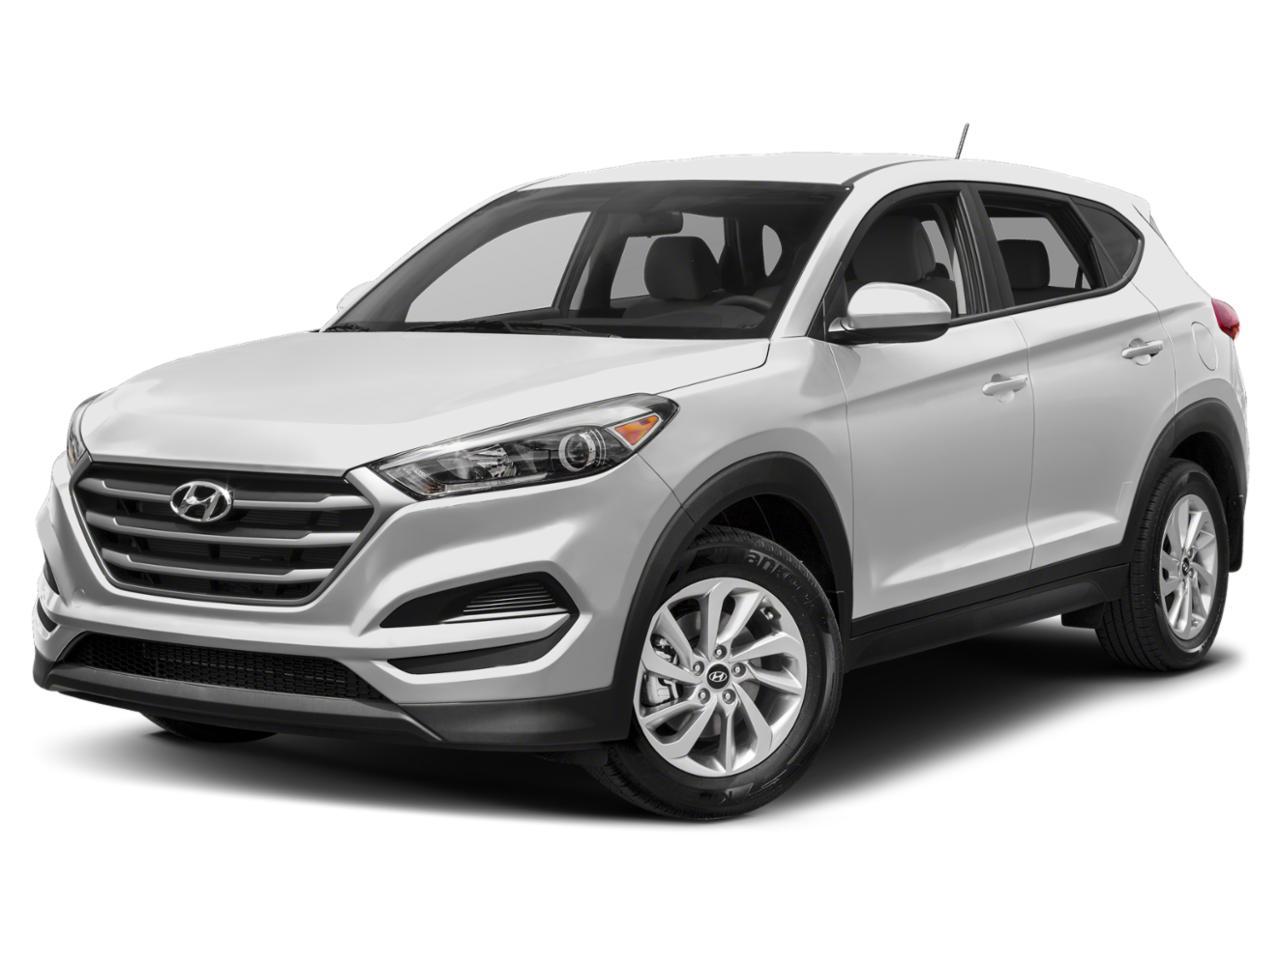 2018 Hyundai Tucson Vehicle Photo in GRESHAM, OR 97030-2678